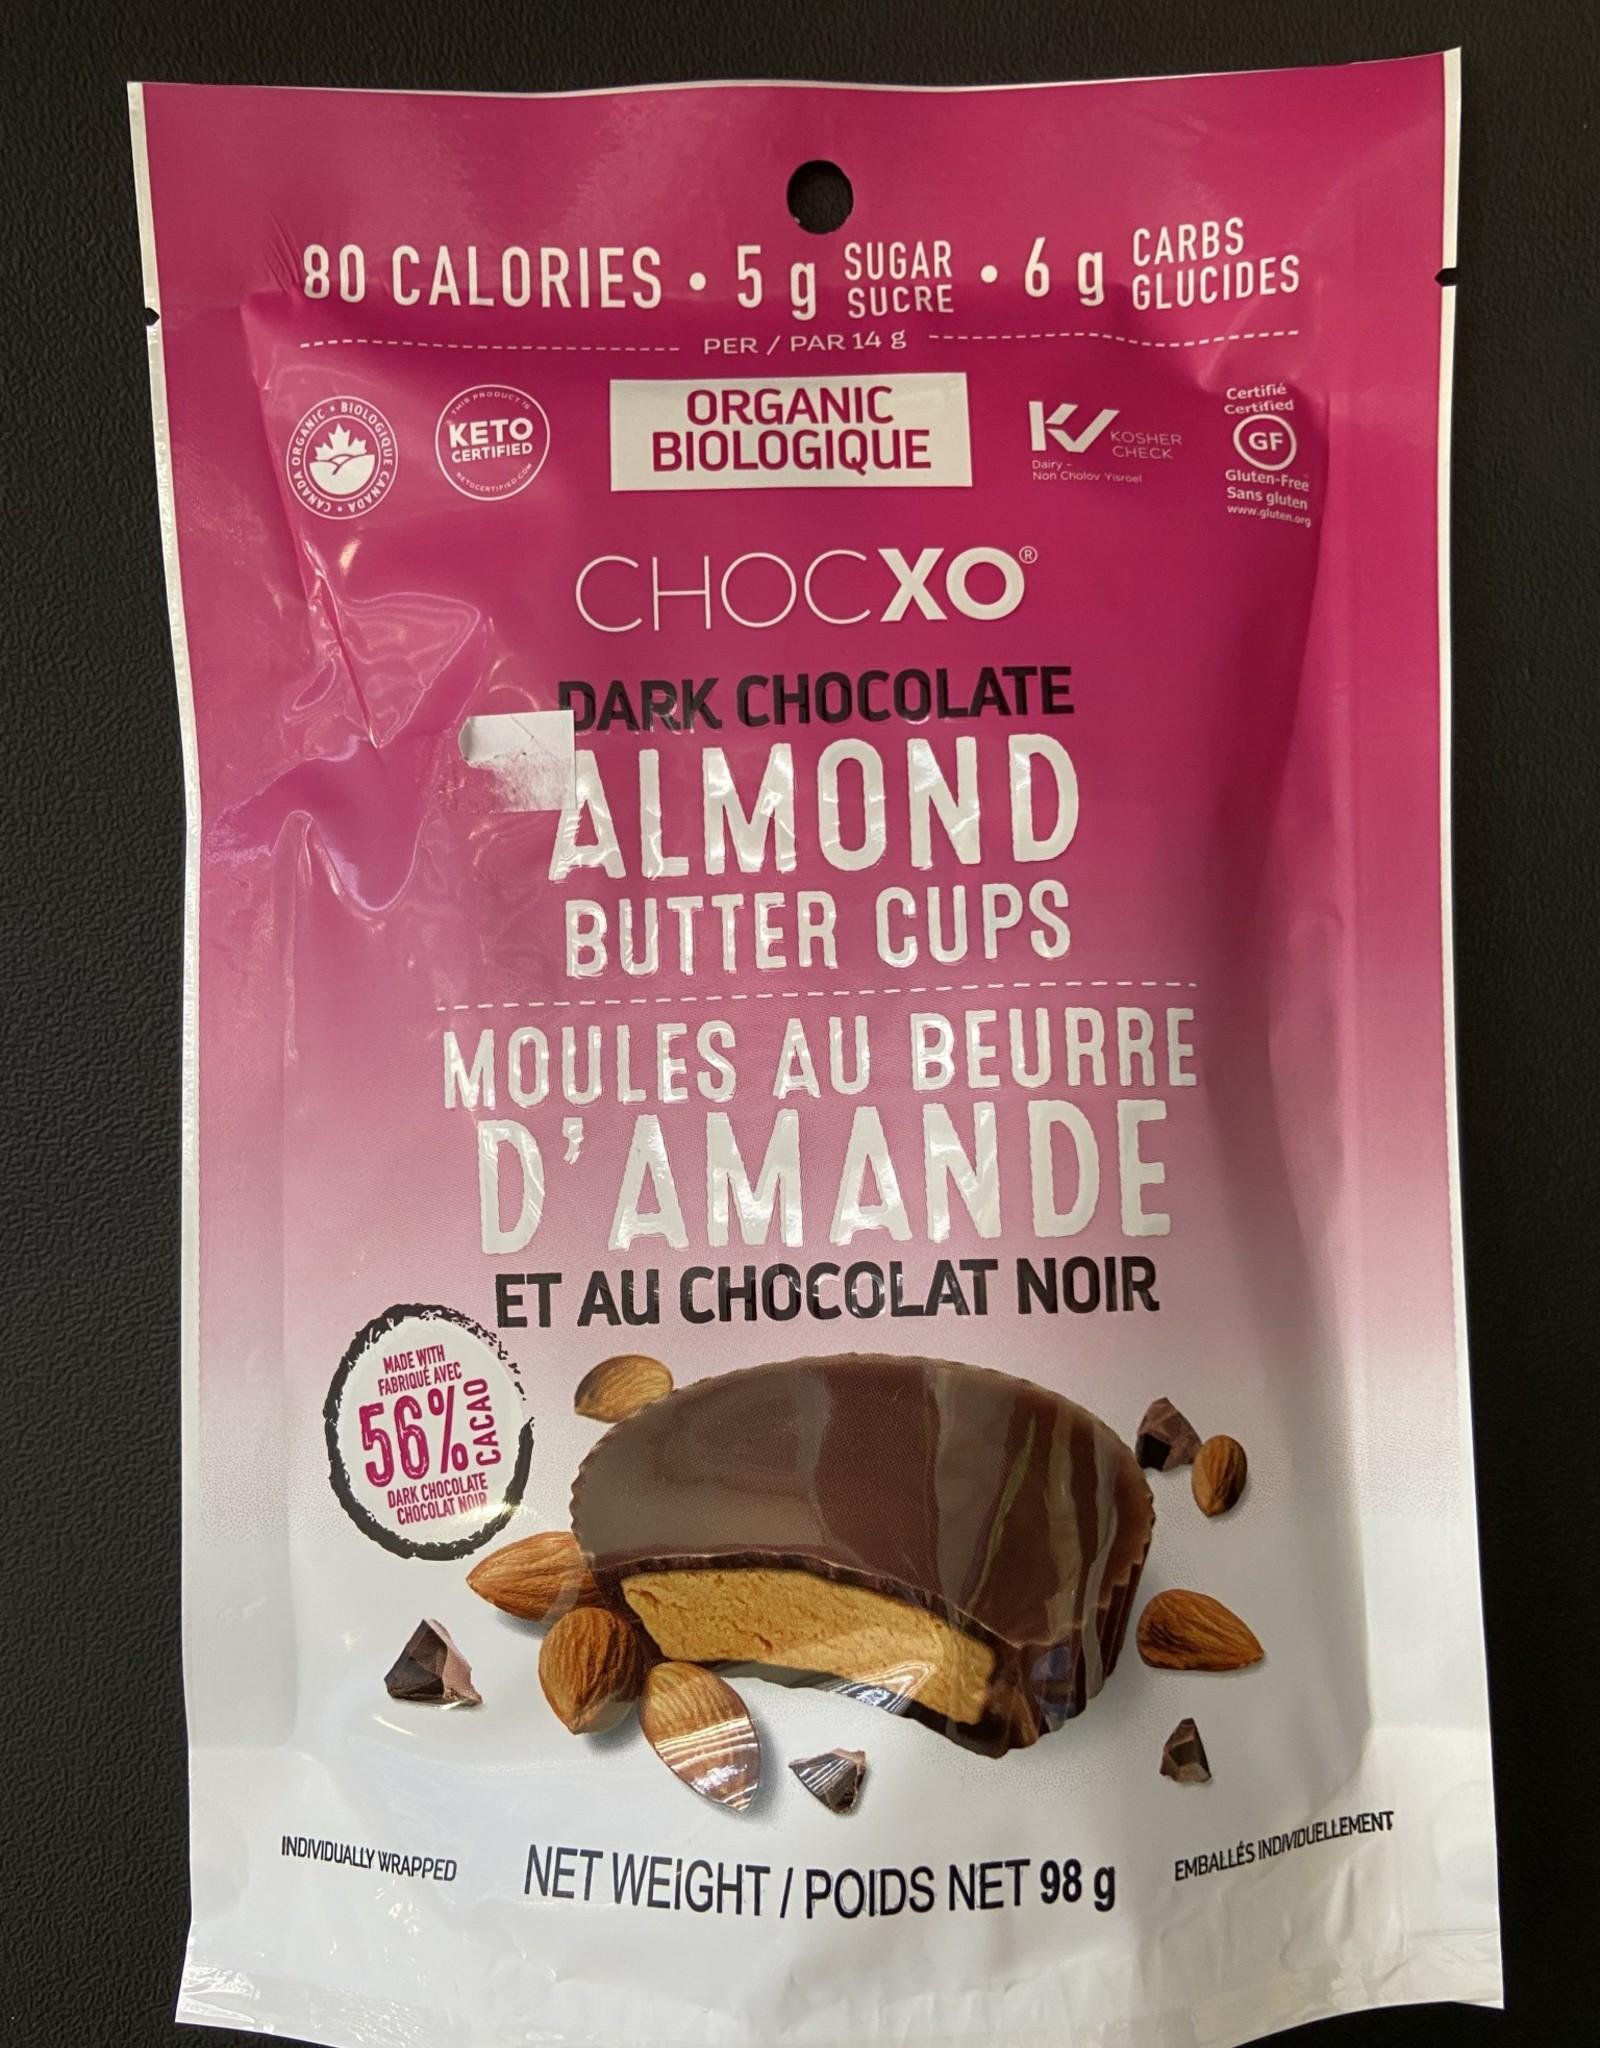 ChocXo CHOCXO - Dark Chocolate Almond Butter Cups, 98g